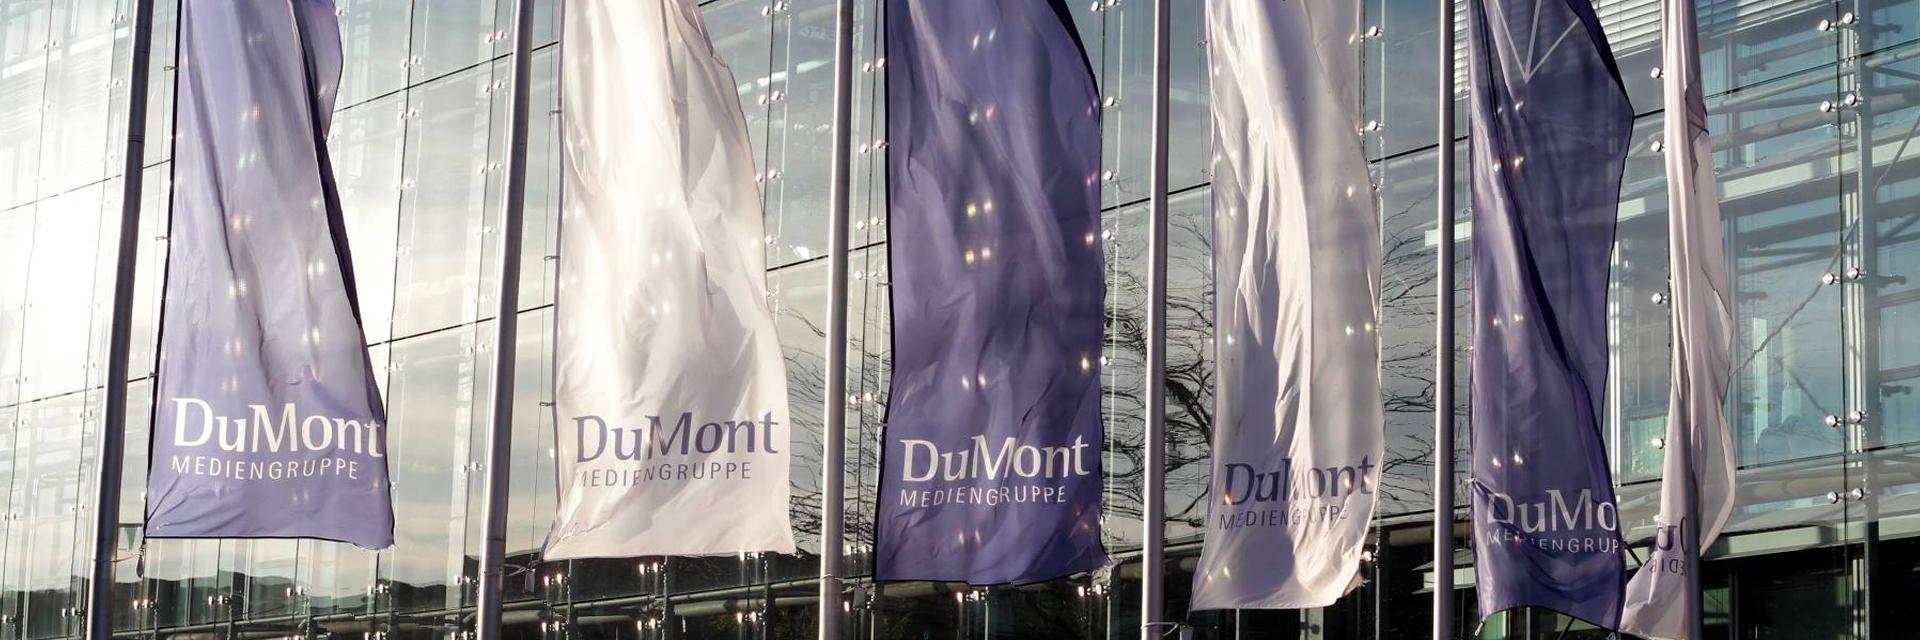 otris vereinfacht Beteiligungsmanagement bei DuMont